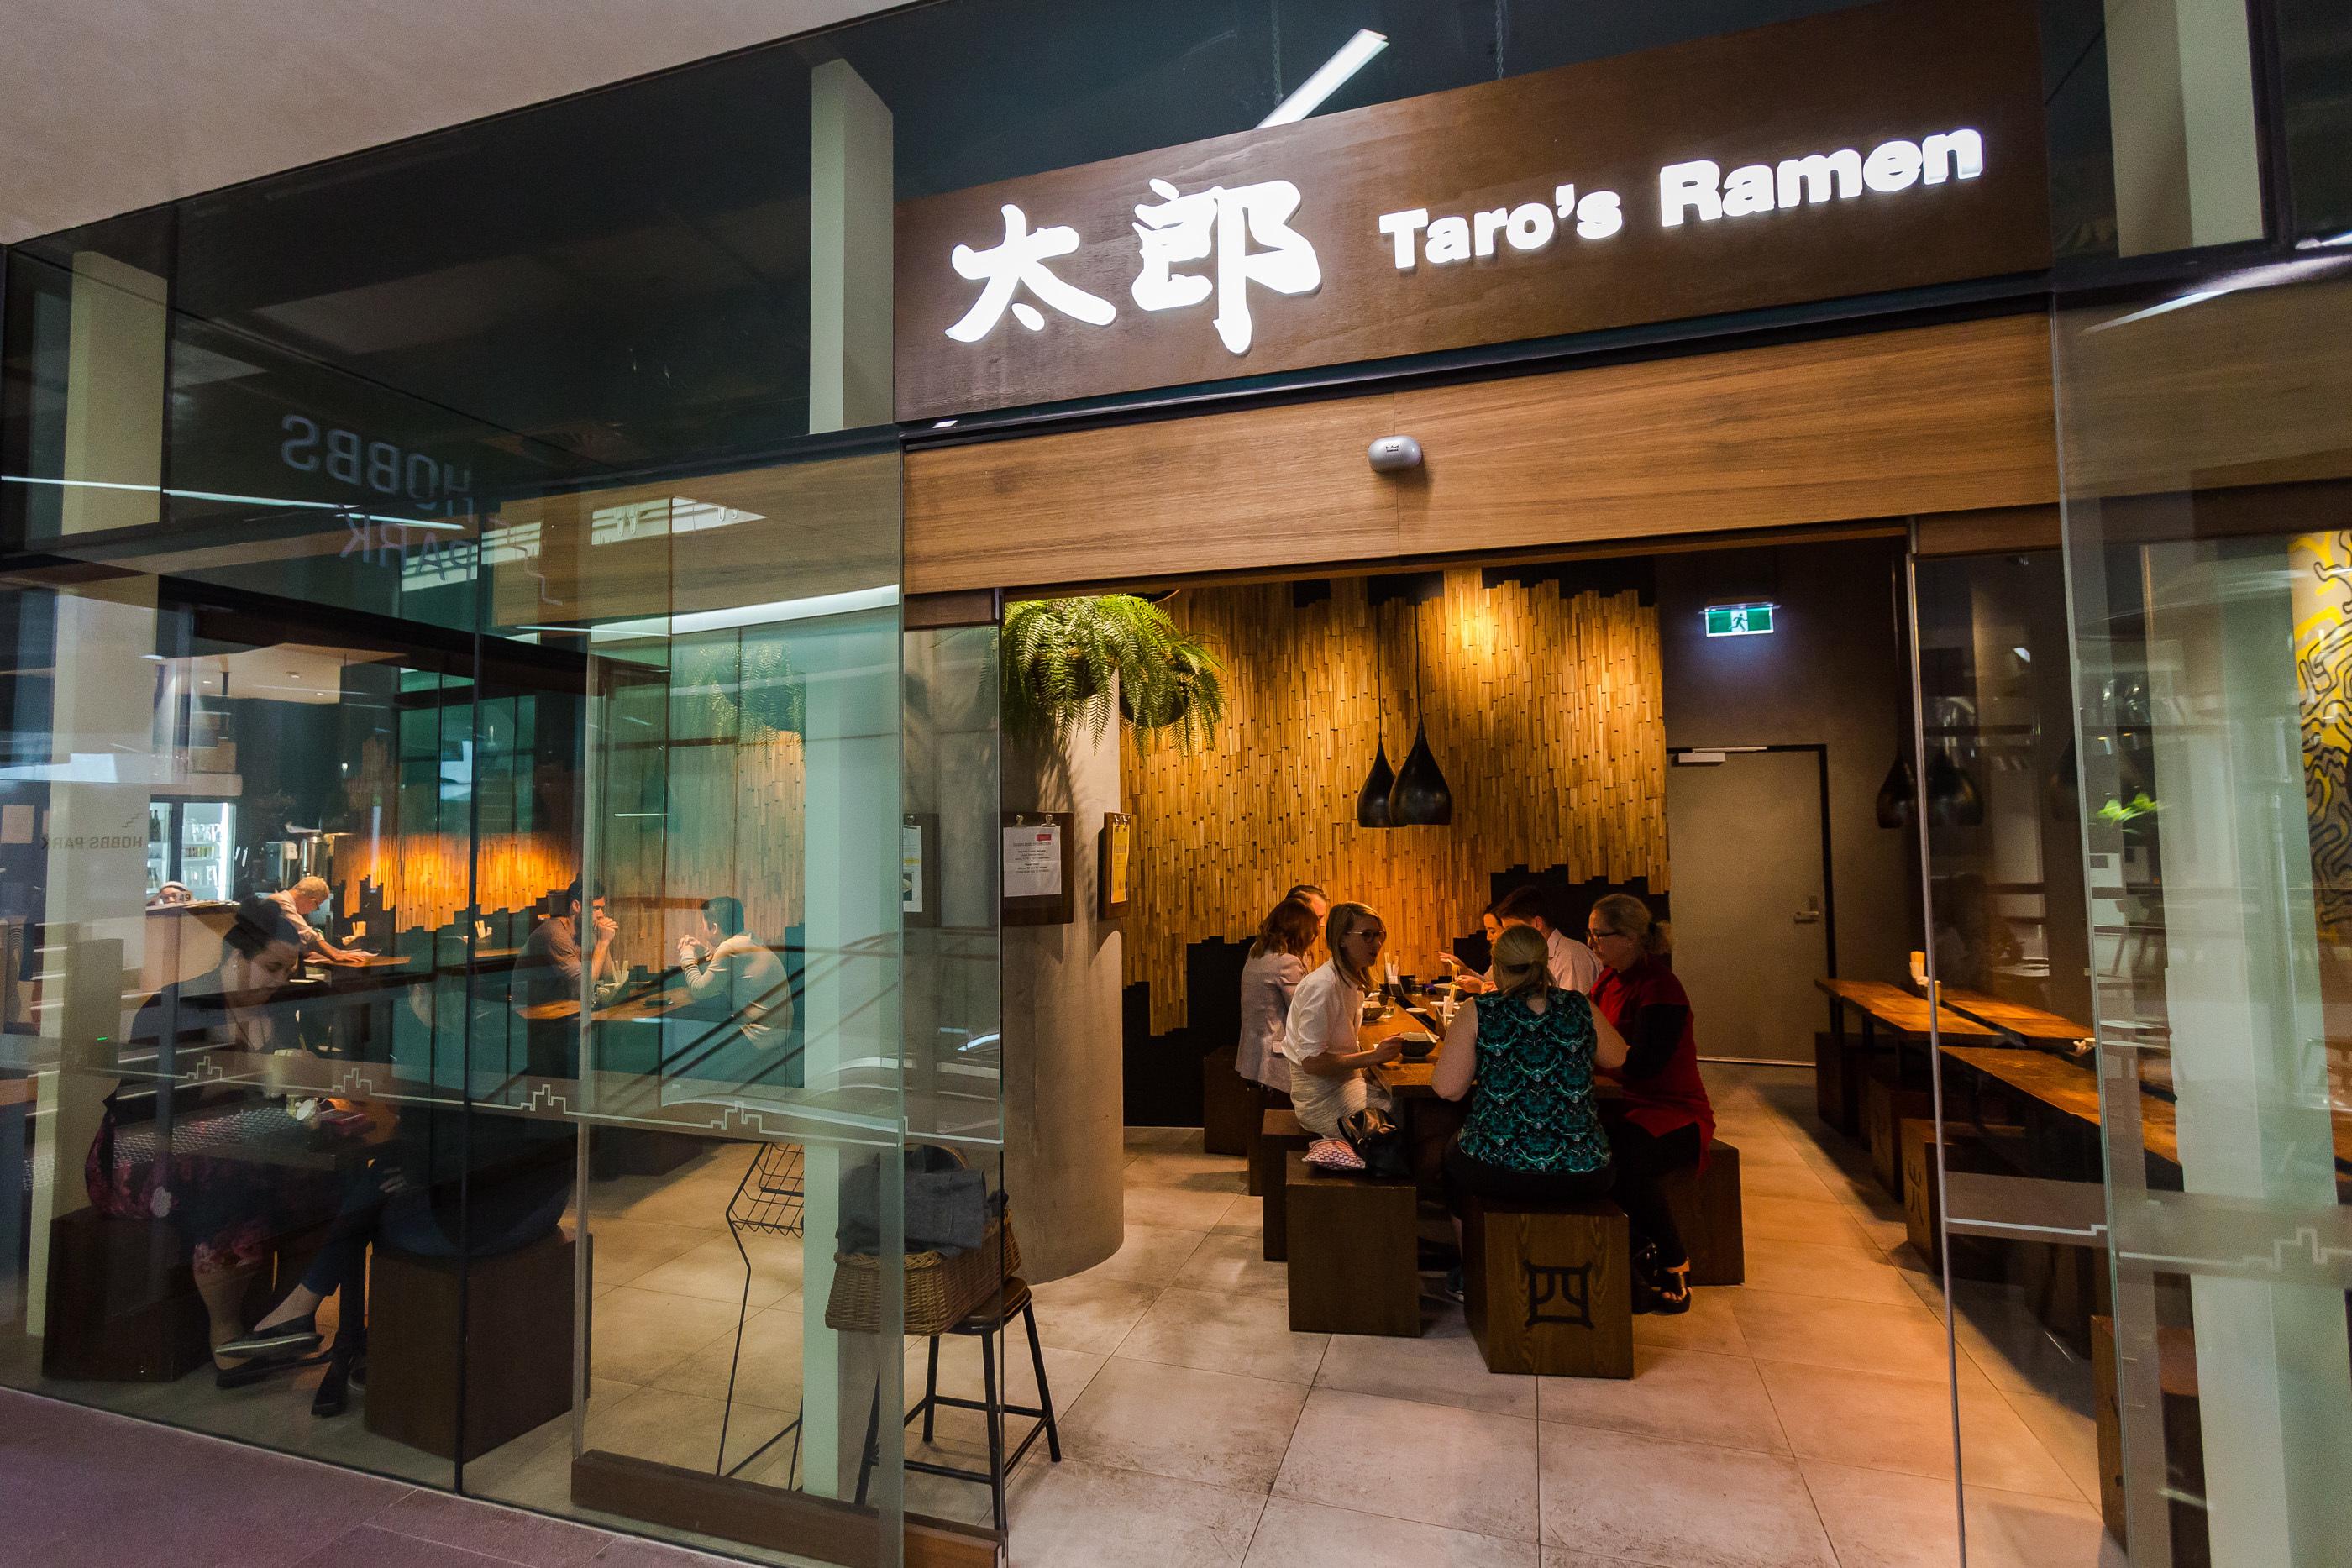 Taro's Ramen